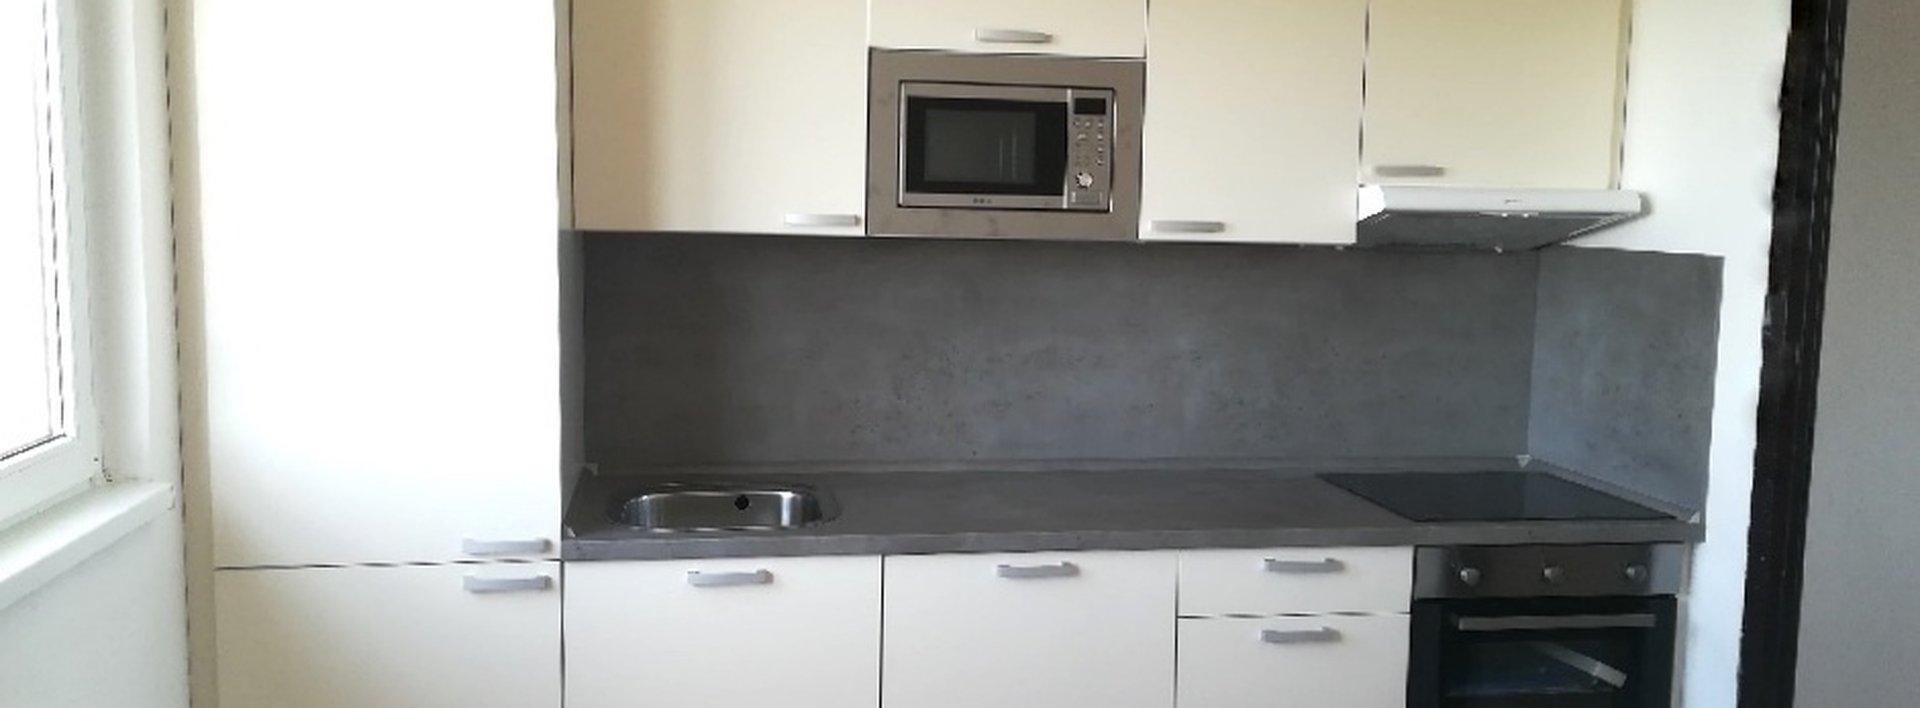 Pronájem bytu 3+1 s lodžií, 70 m² - Liberec, ul. Gagarinova, Ev.č.: N48470